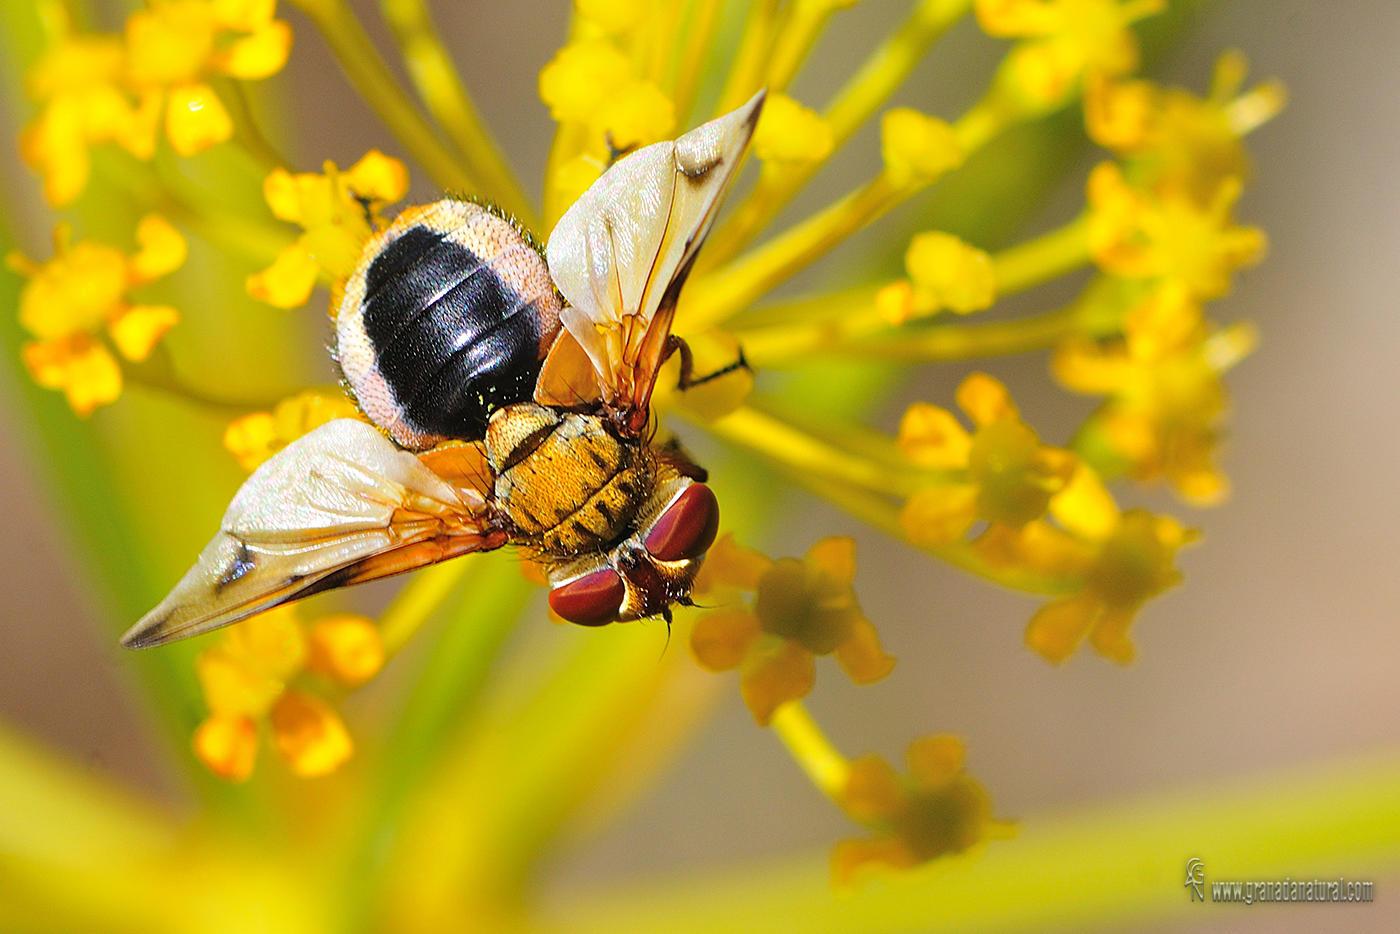 Mosca sobre cañaeja ( Familia Tachinidae, Subfamilia Phasiinae) (Lucas Gutierrez Jiménez)